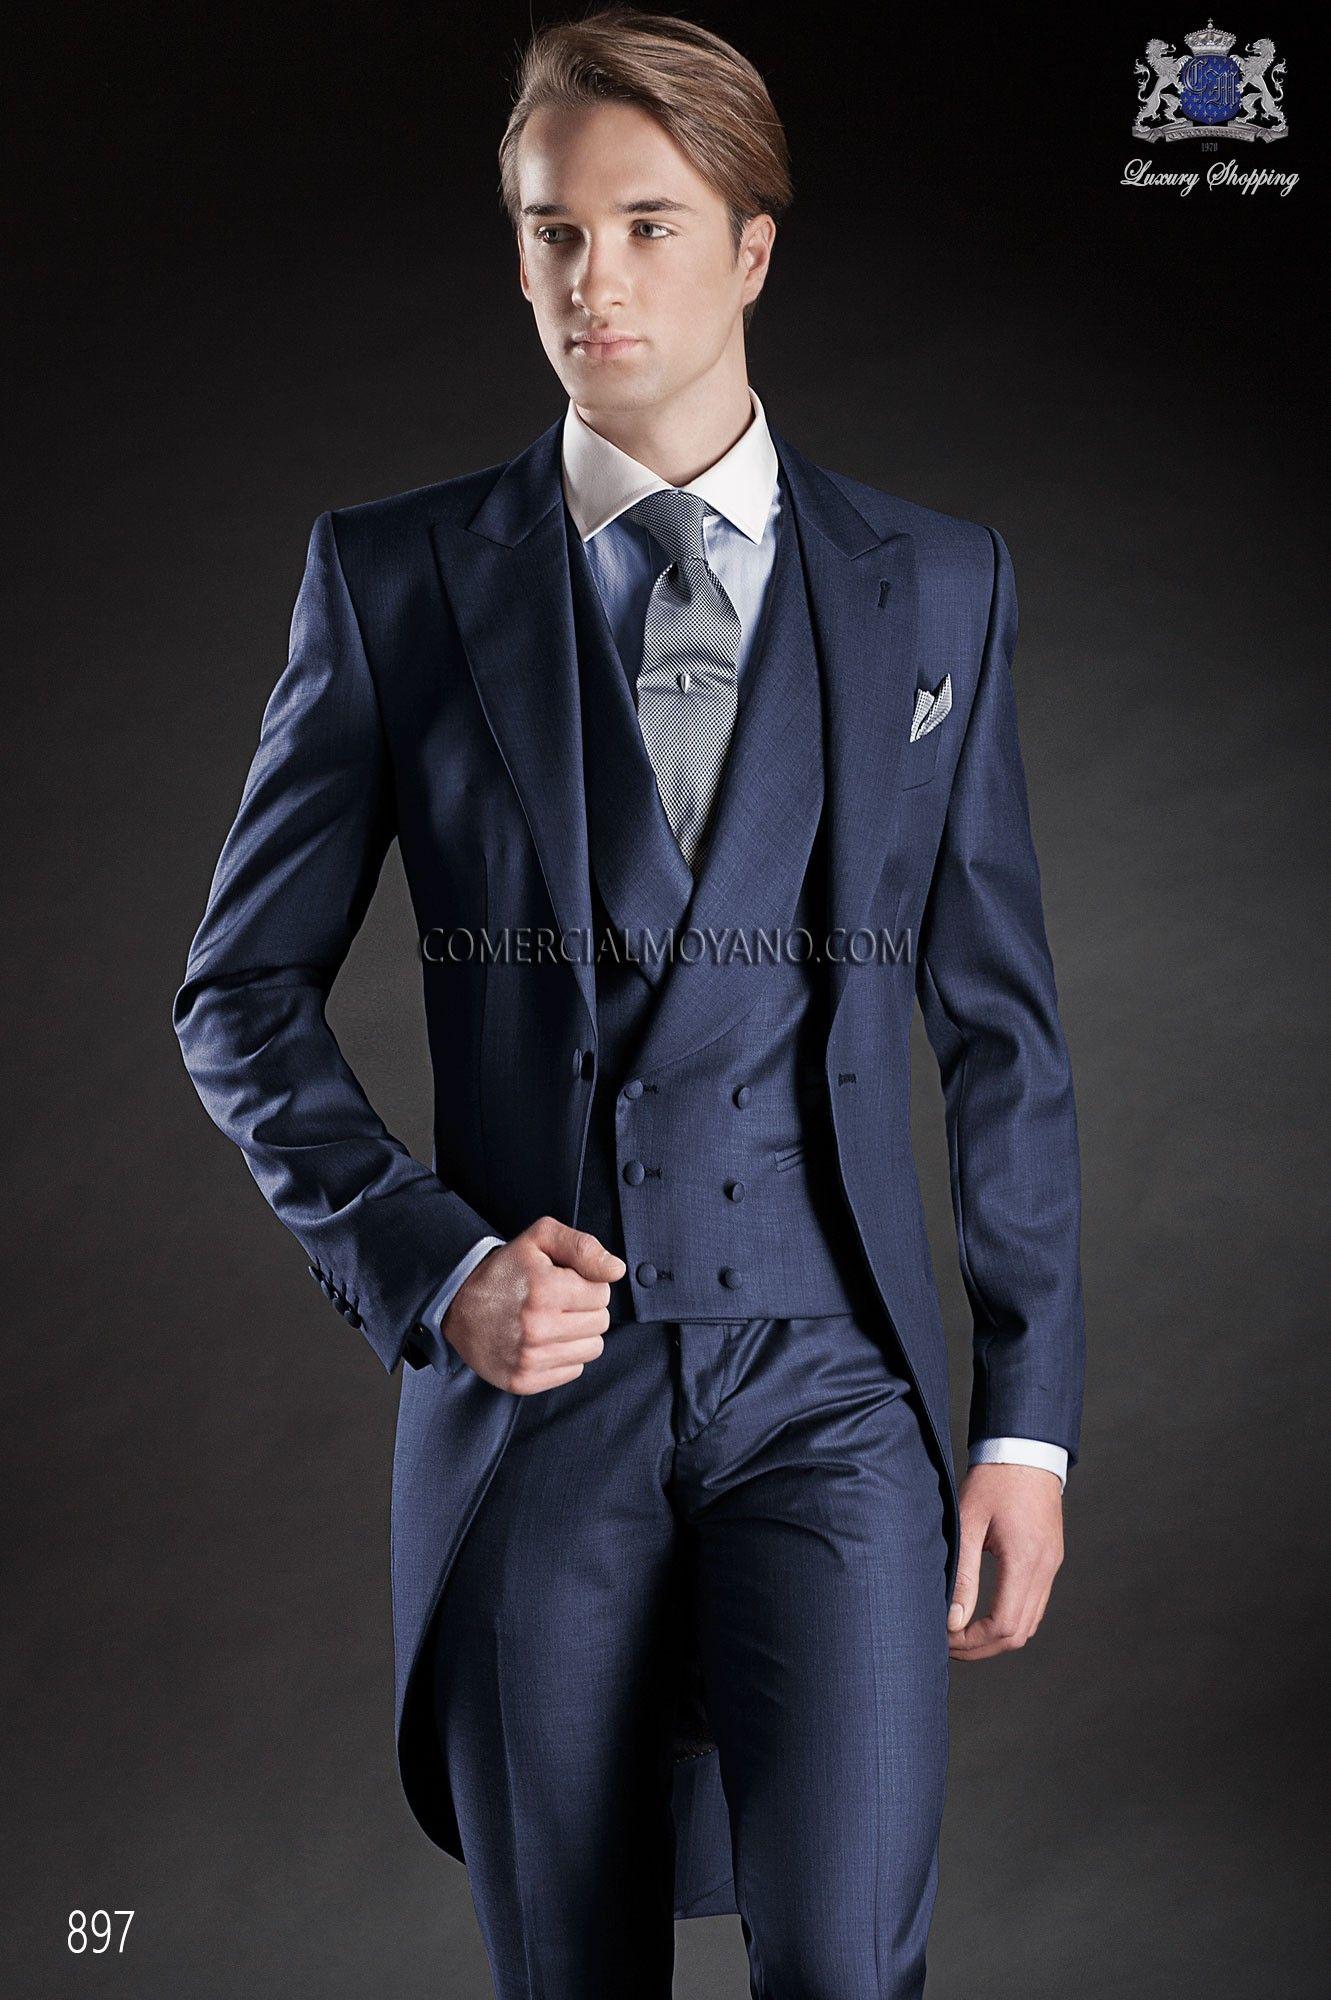 Italienische Cut, unifarbig blau | Pinterest | Anzüge, Anzug ...